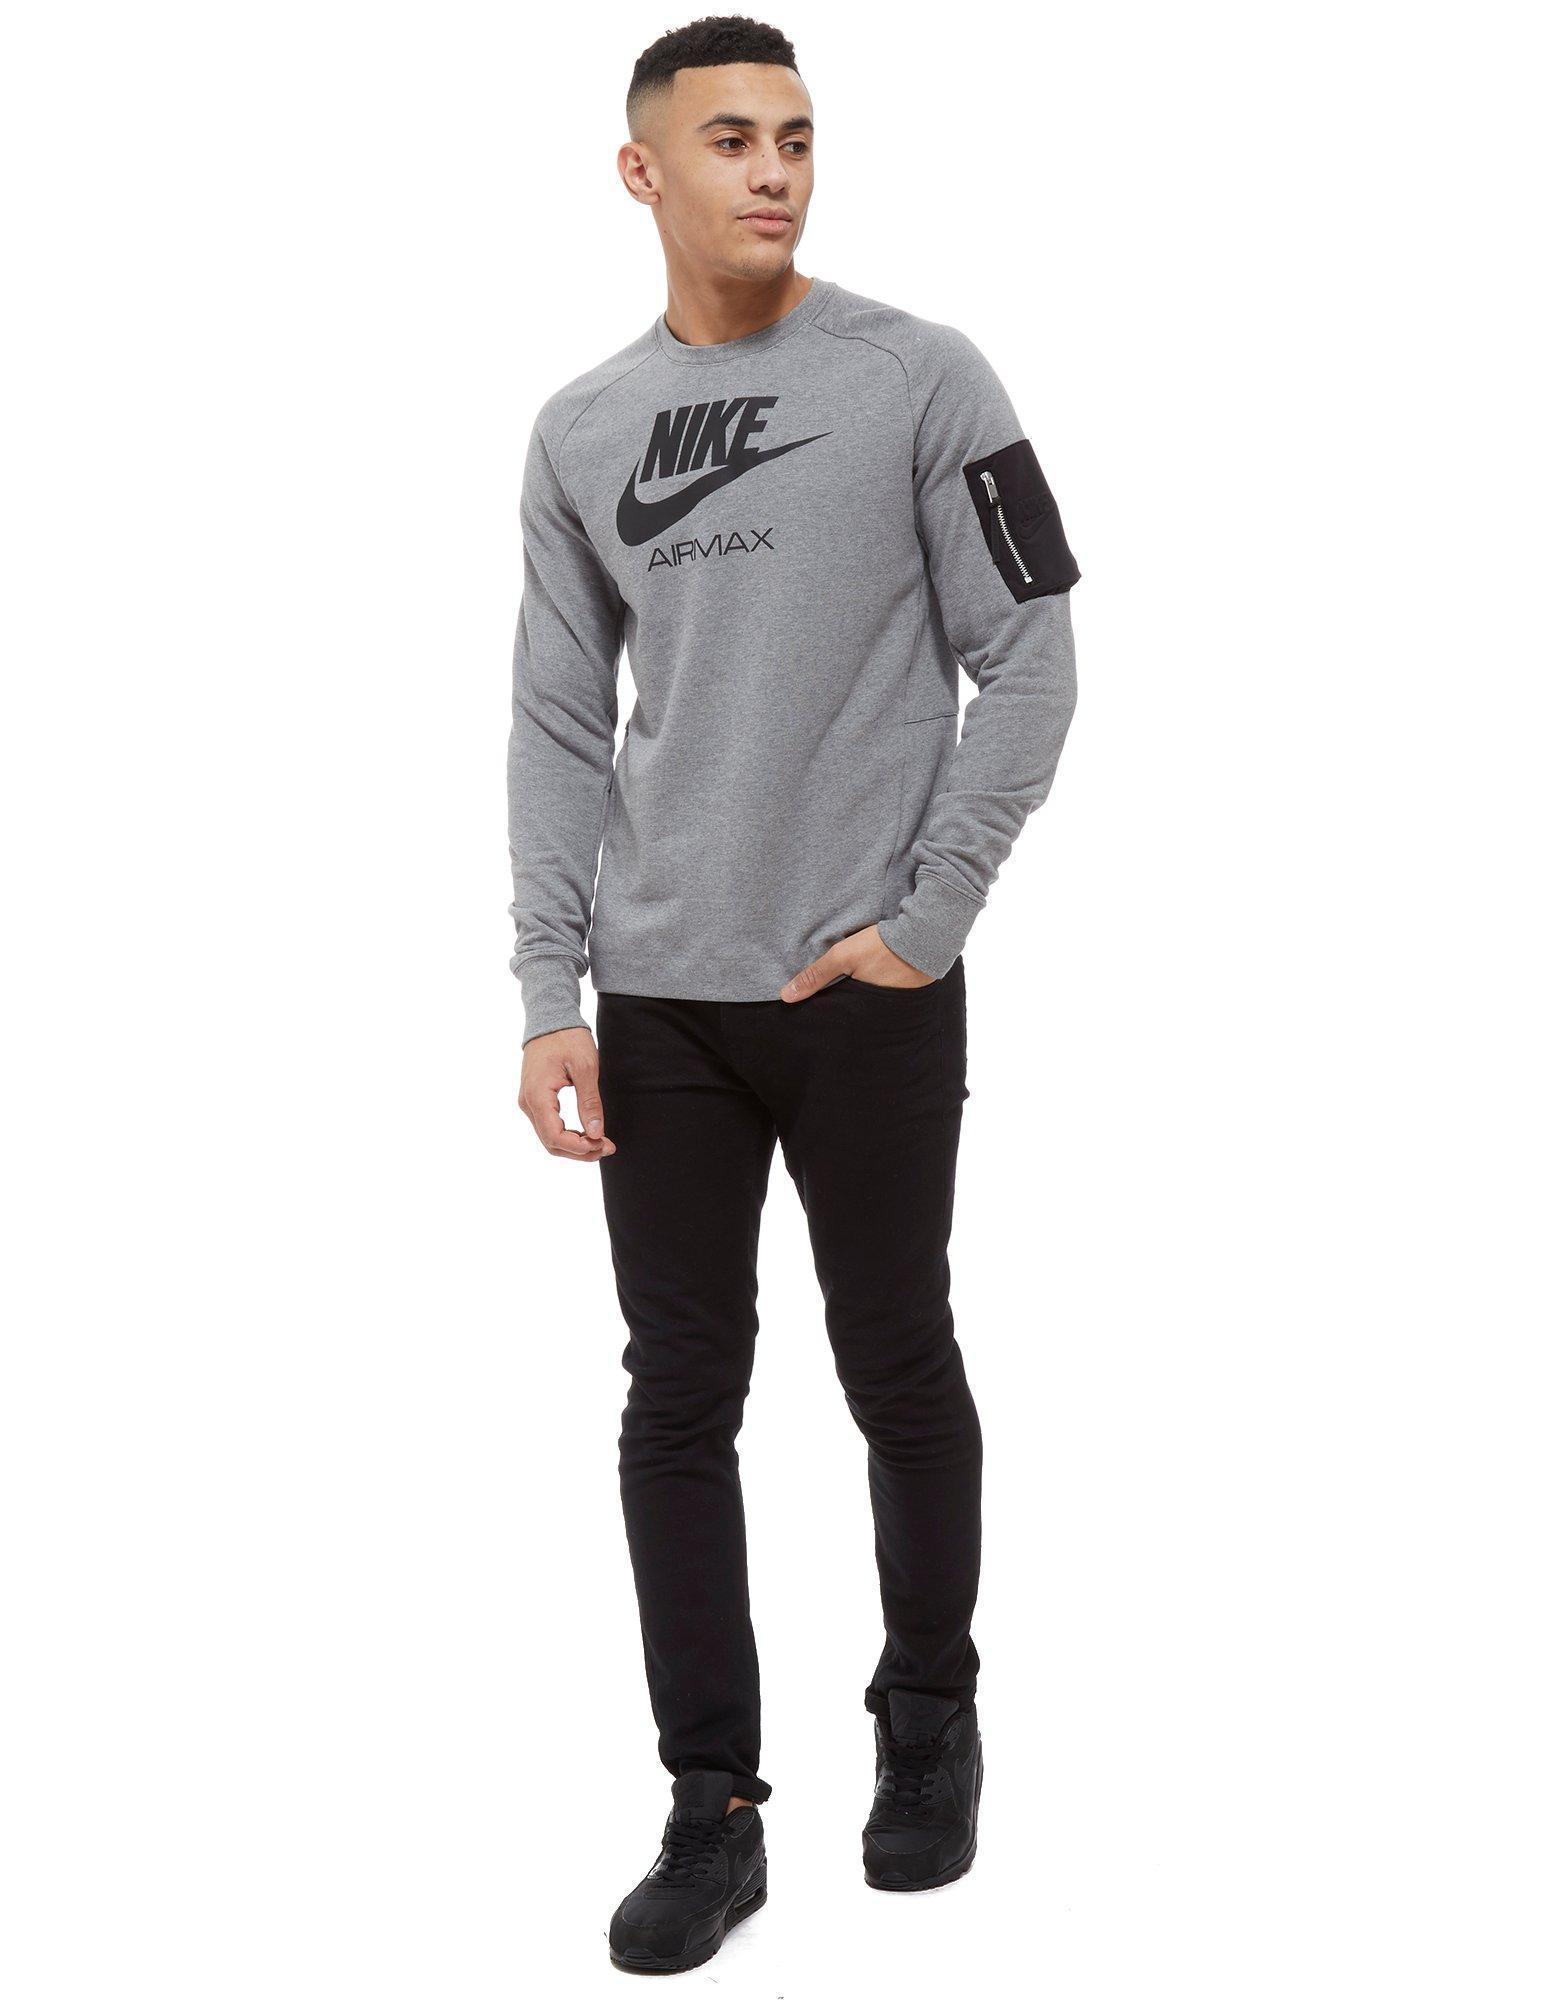 Nike Cotton Air Max Ft Crew Sweatshirt